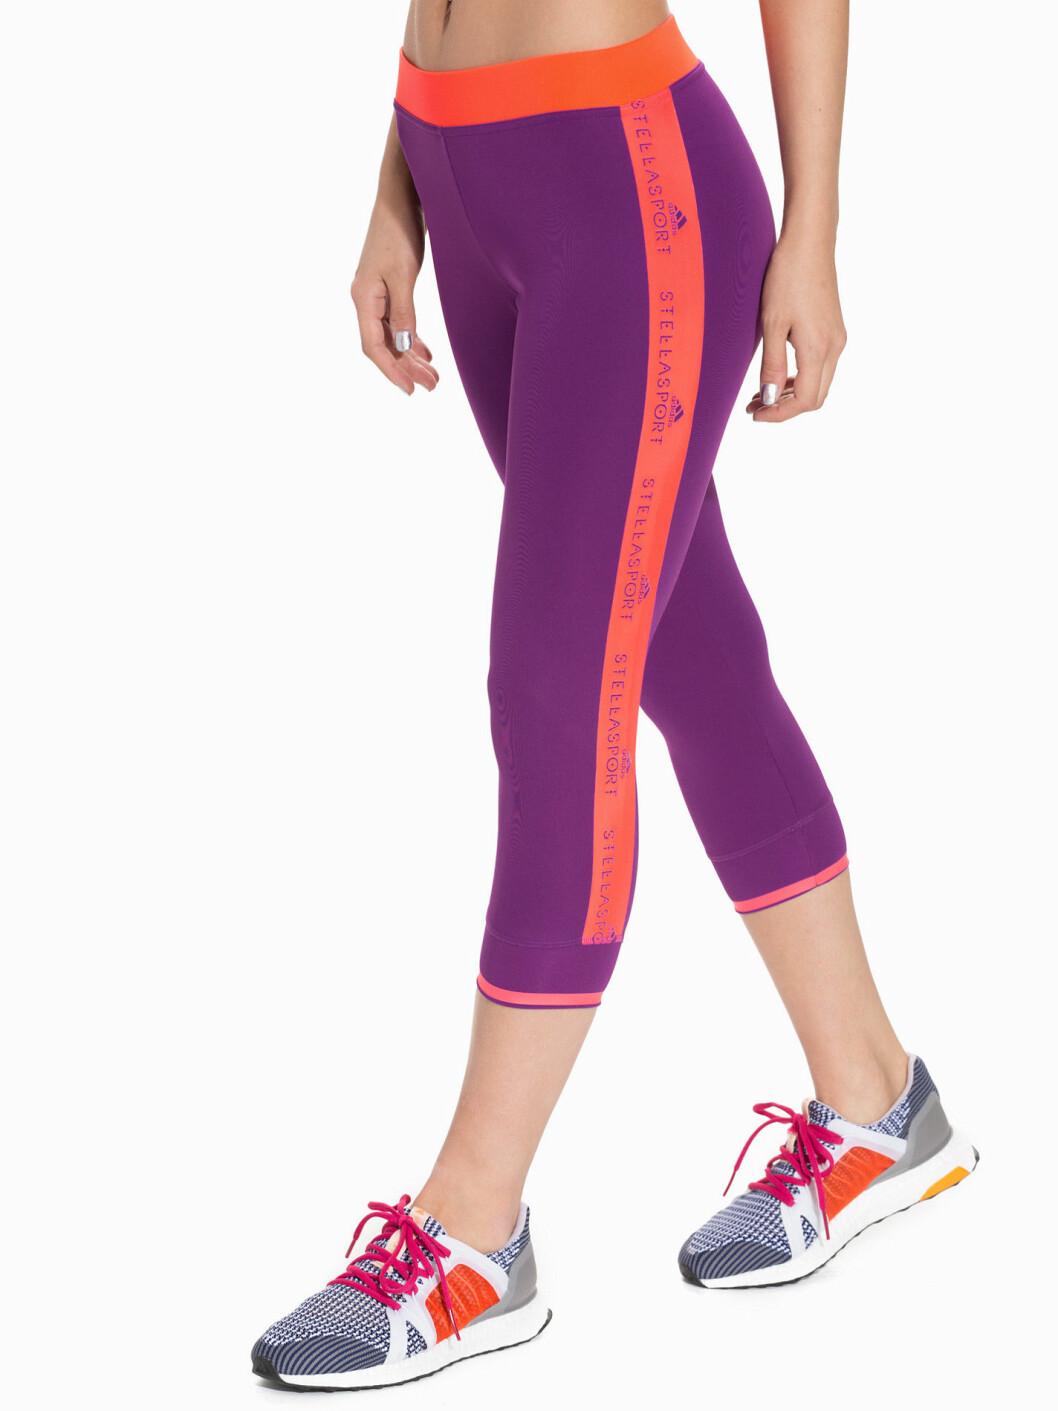 tights_adidas_stella_sport